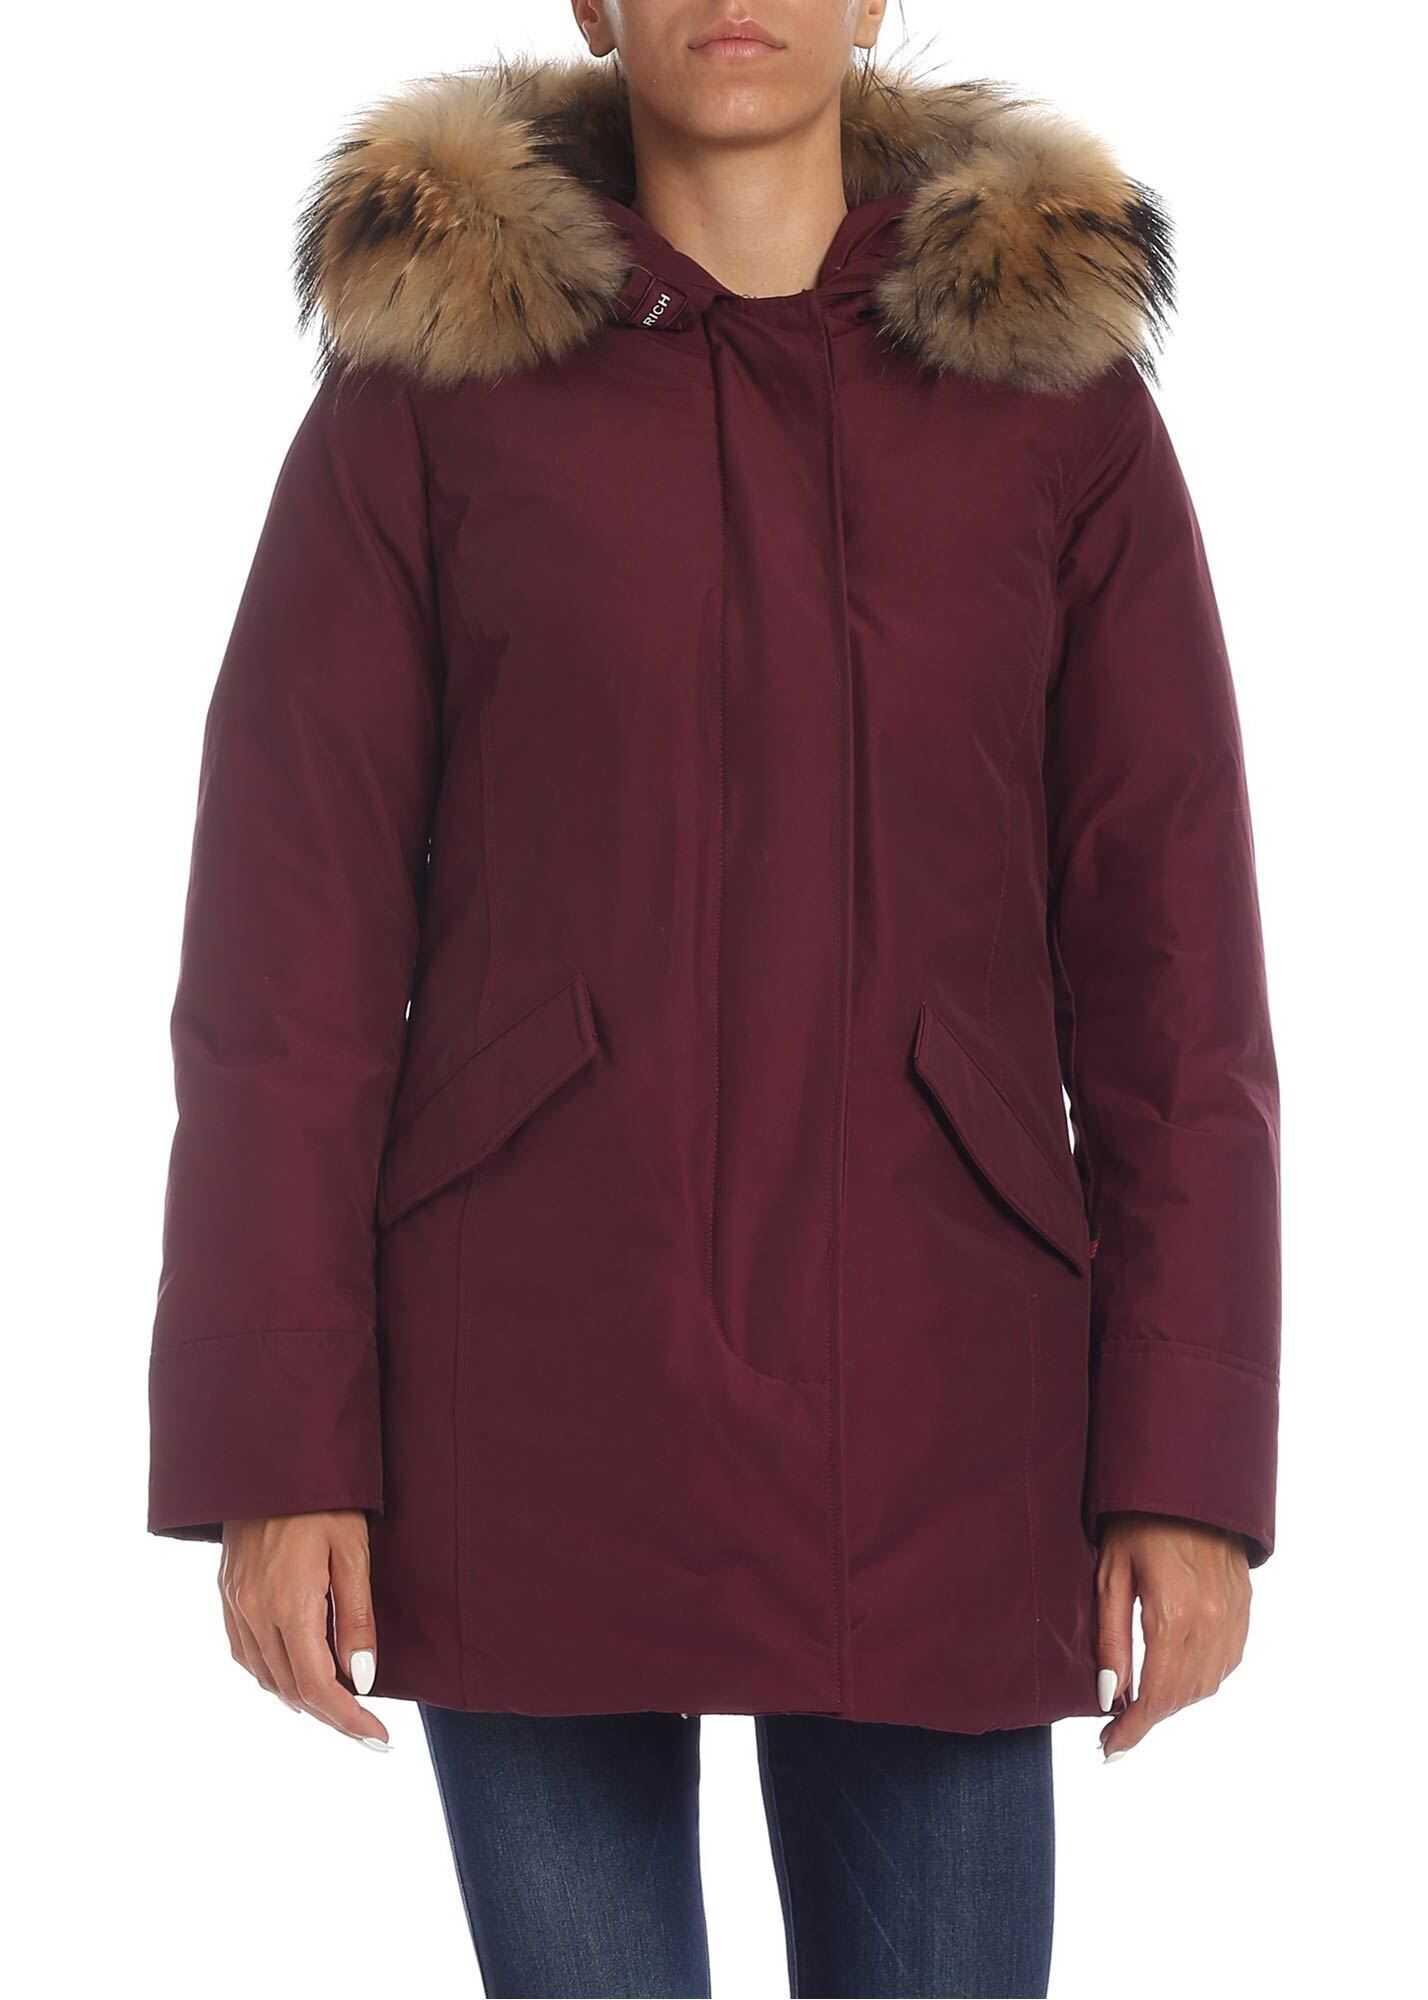 Woolrich Arctic Parka Jacket In Wine Color Purple